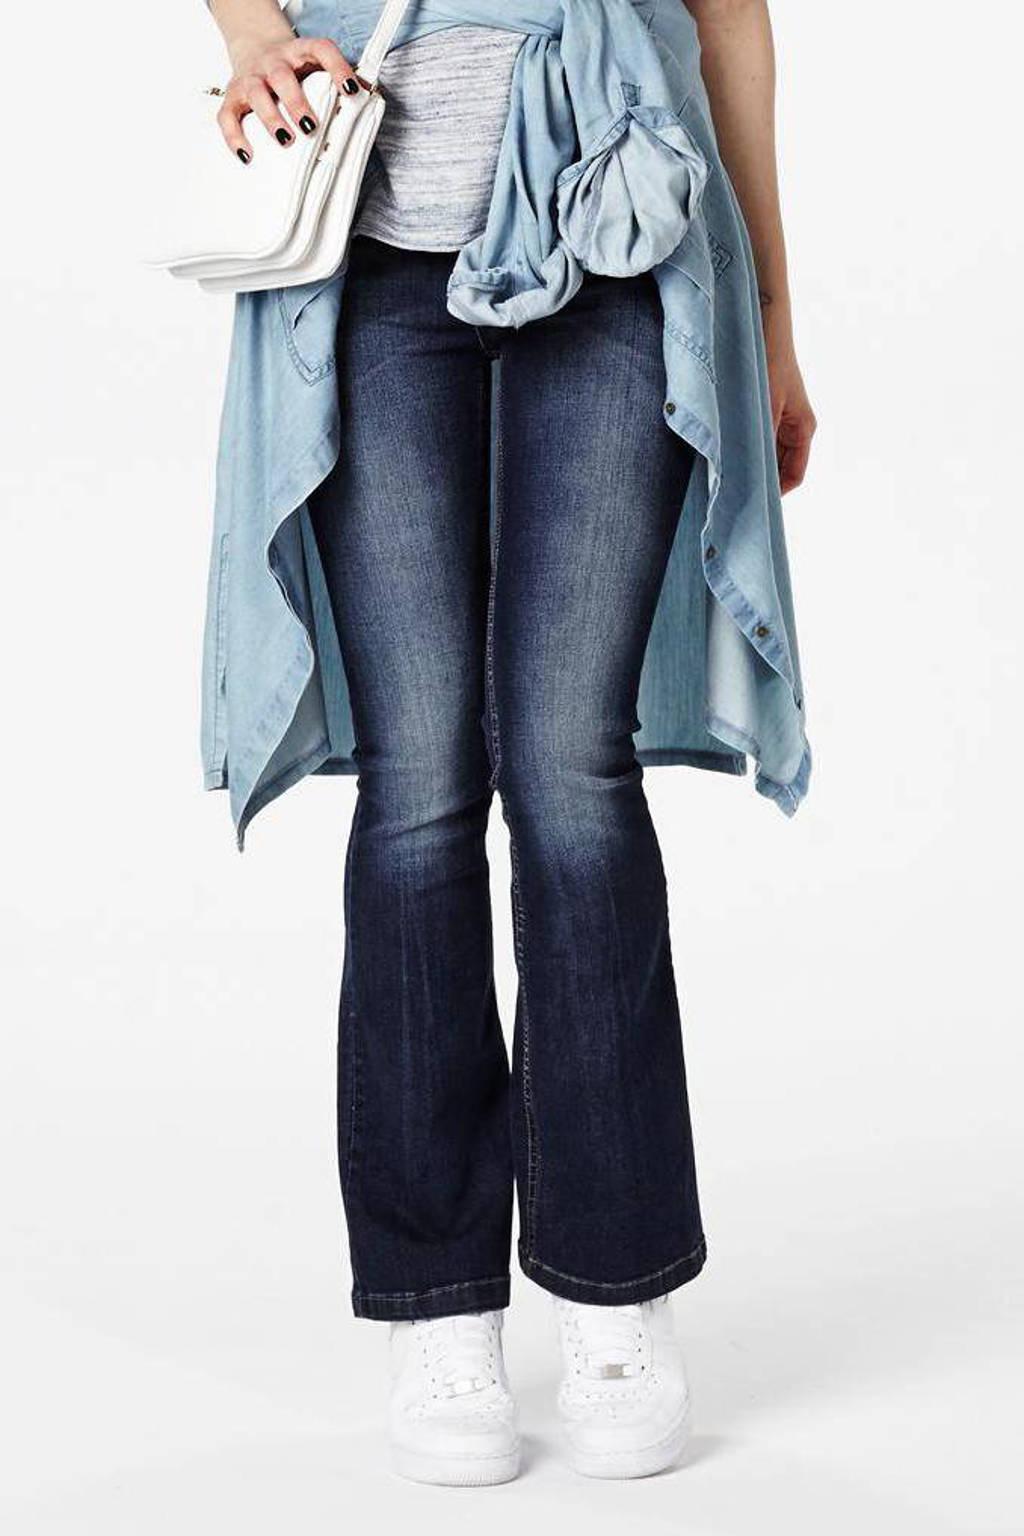 Lois Melrose flared jeans, Celine 6 Meses